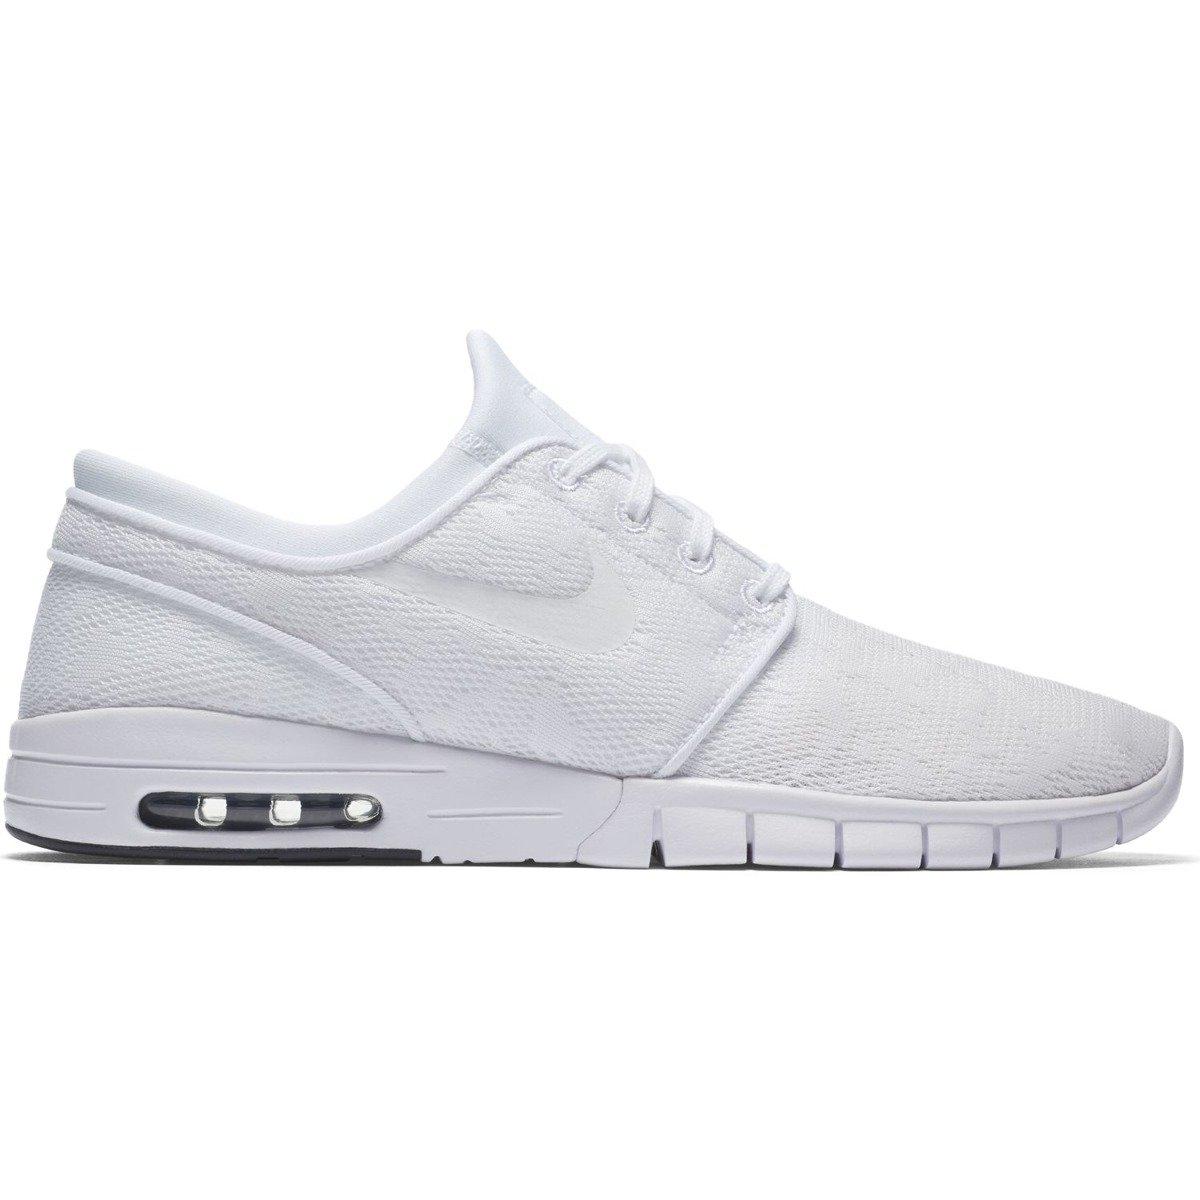 size 40 6f10c 74900 shoes nike sb stefan janoski max WHITE WHITE-OBSIDIAN Click to zoom ...